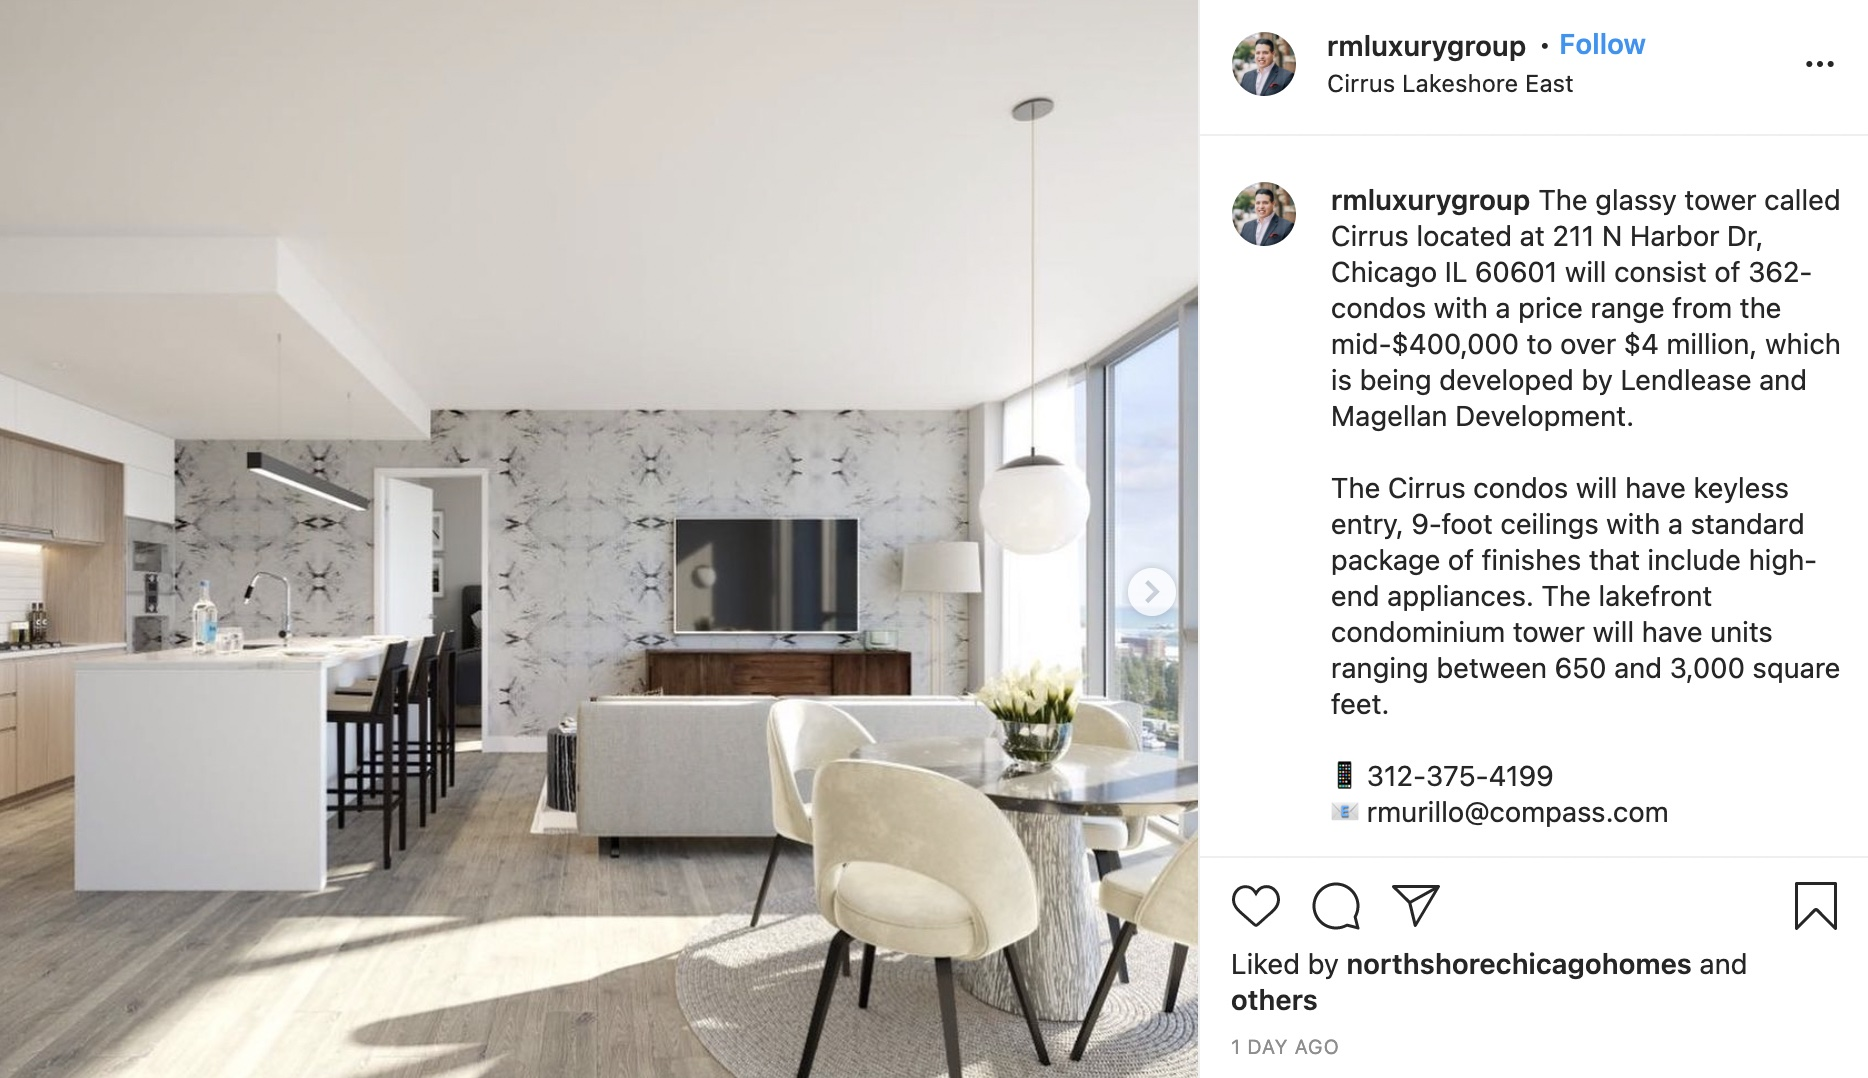 illinois real estate agents